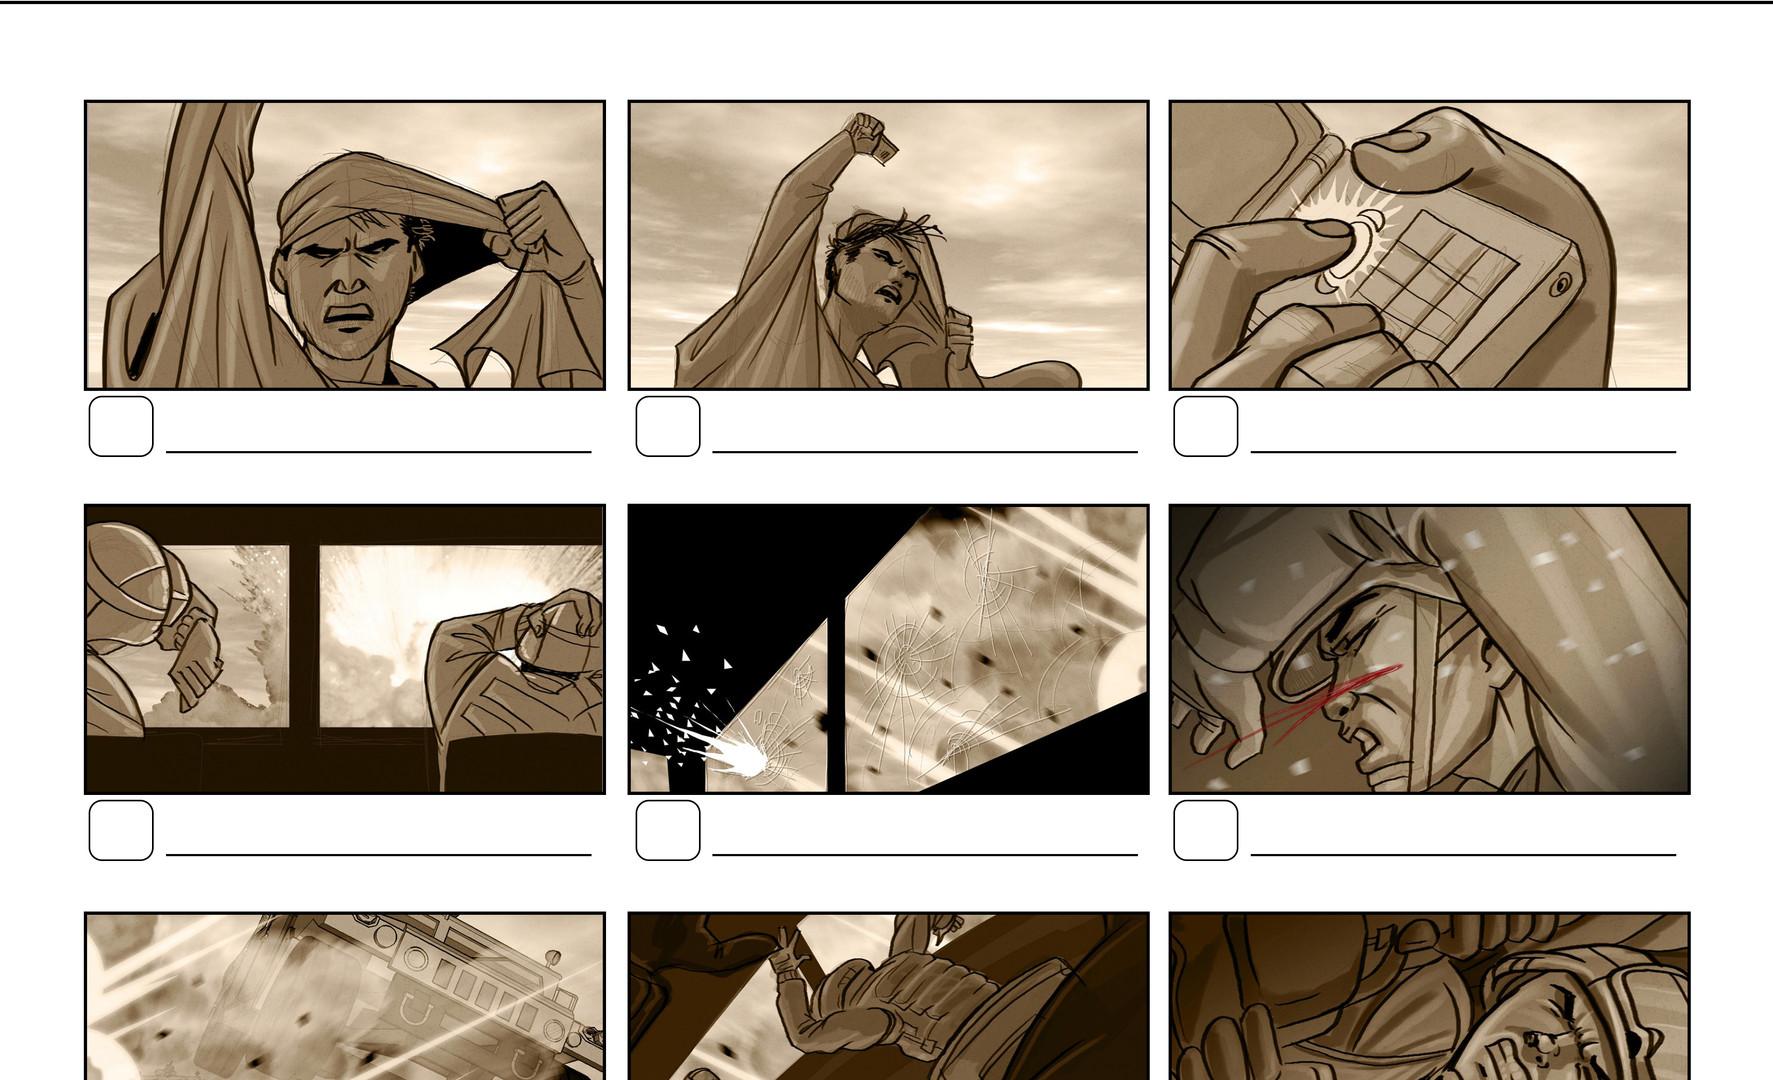 DM_storyboards_HeartsintheSand_03.jpg